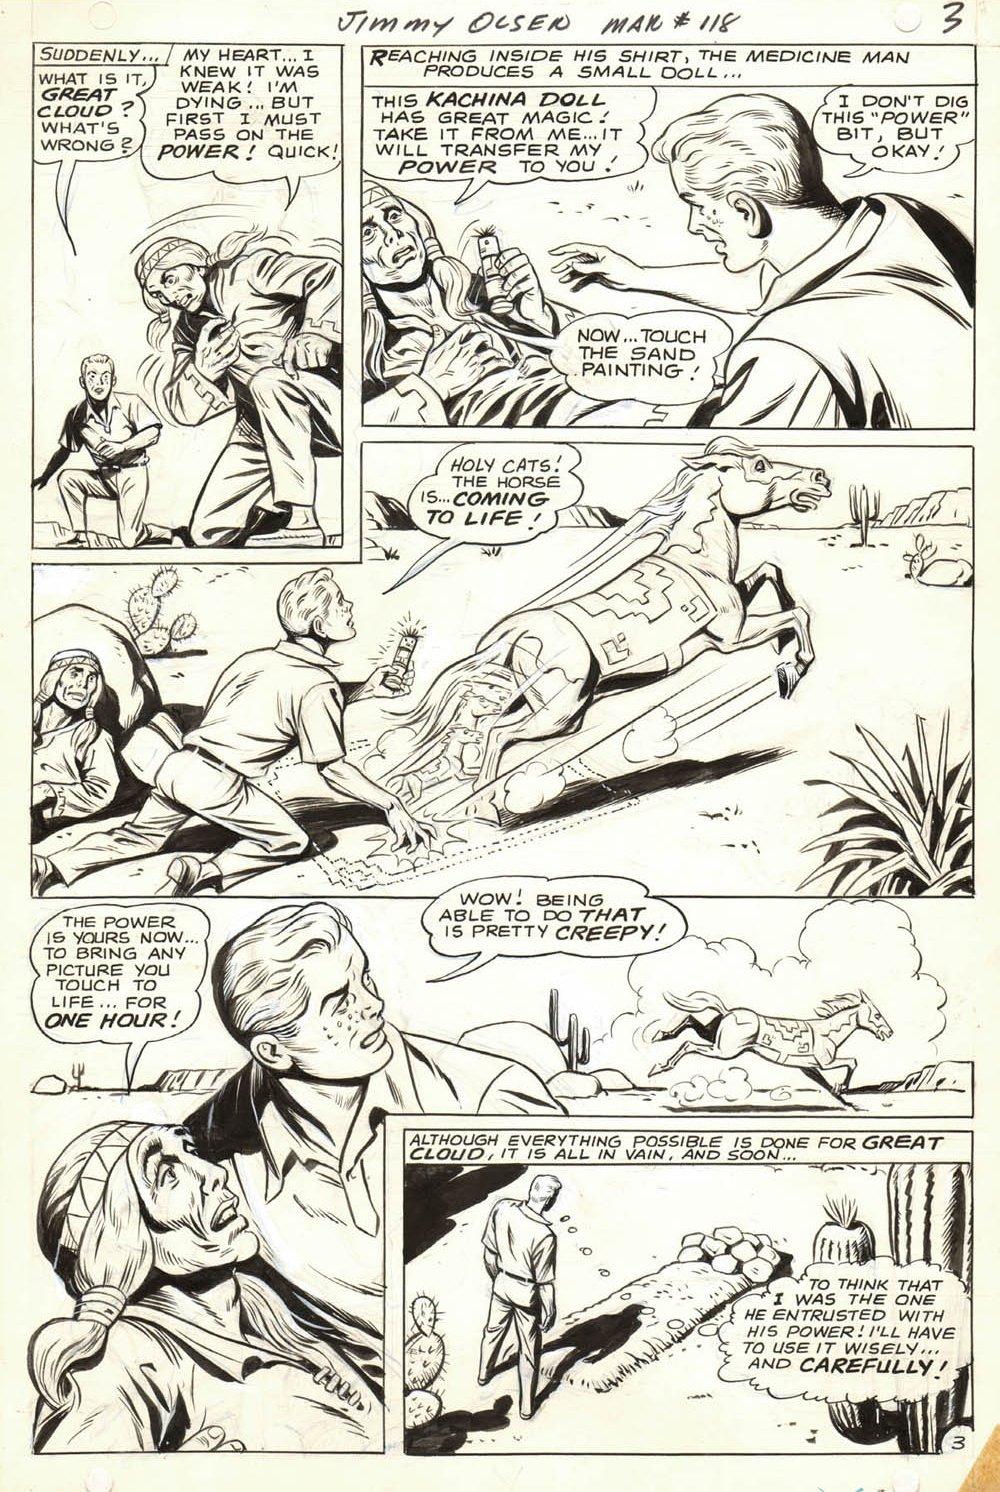 Jimmy Olsen #118 p 3 (Jimmy Olsen Gets Medicine Man's Magic Power!) 1968